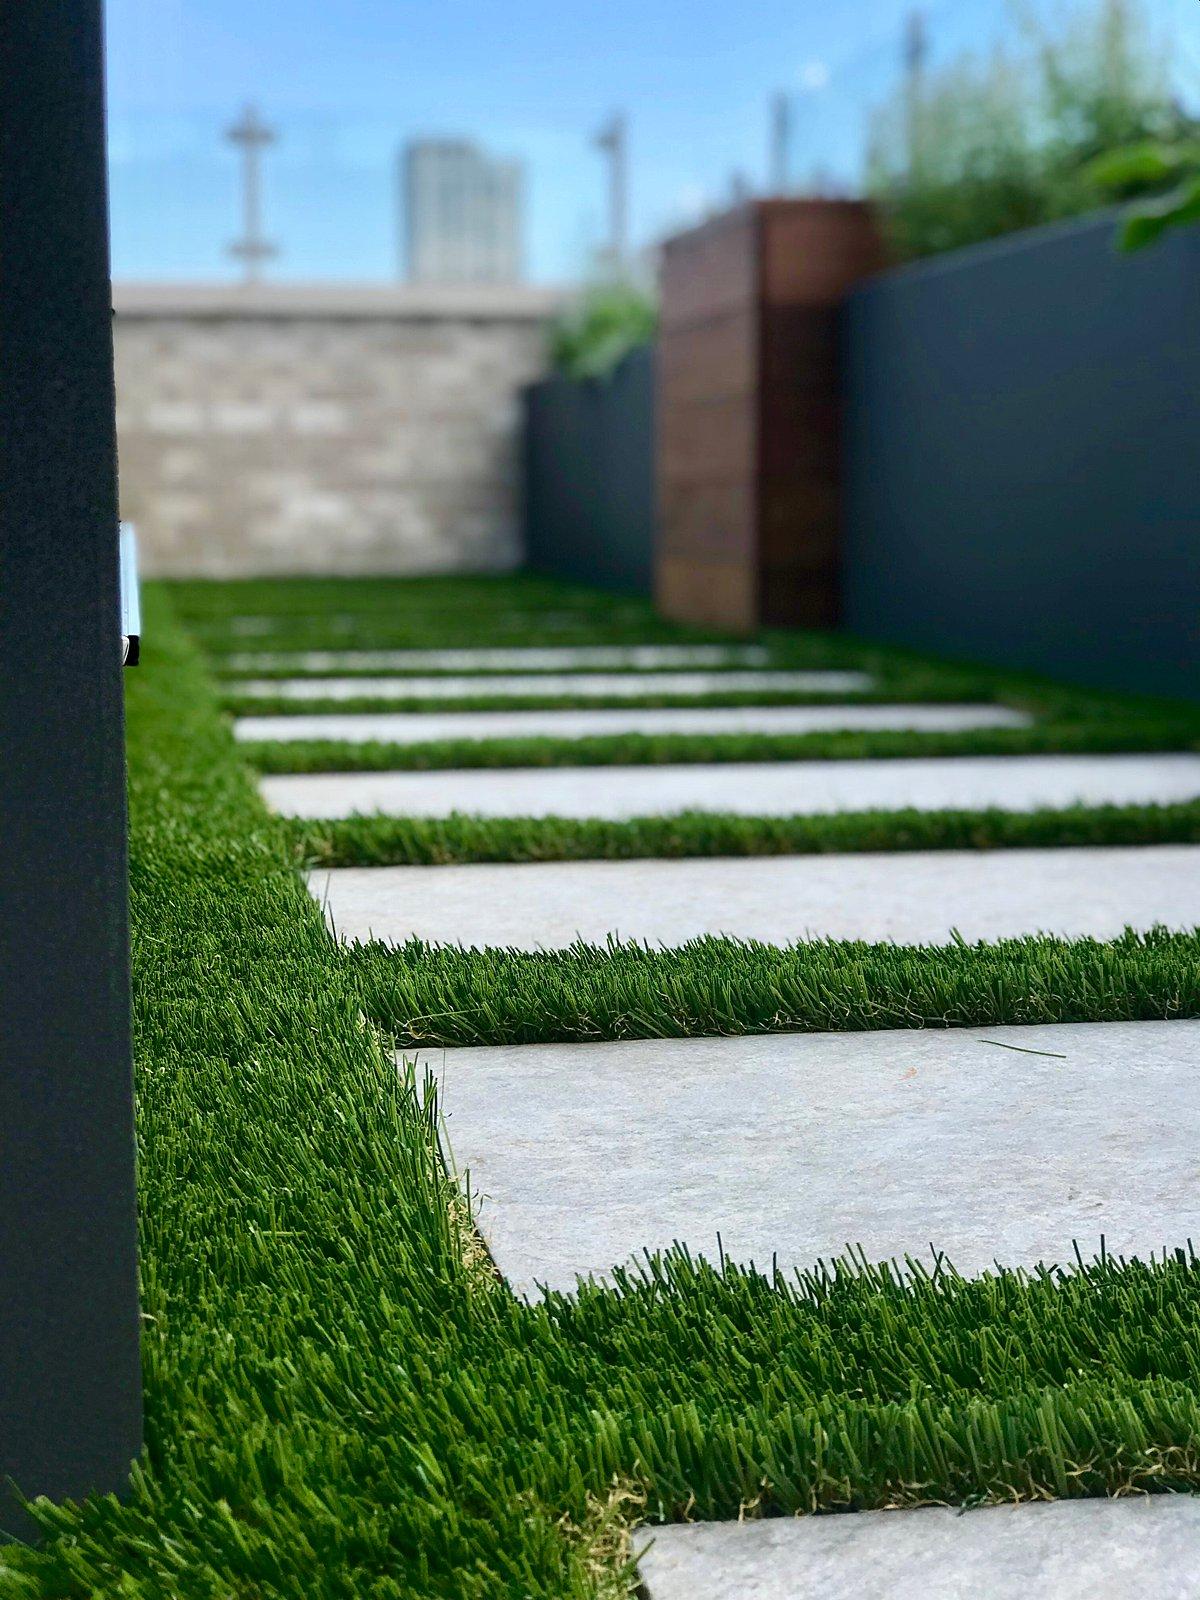 rooftop-lawn-grass-chicago-artificial lawn-turf-turf company-rooftop lawn-rooftop landscape-artificial grass-pet turf-7-min